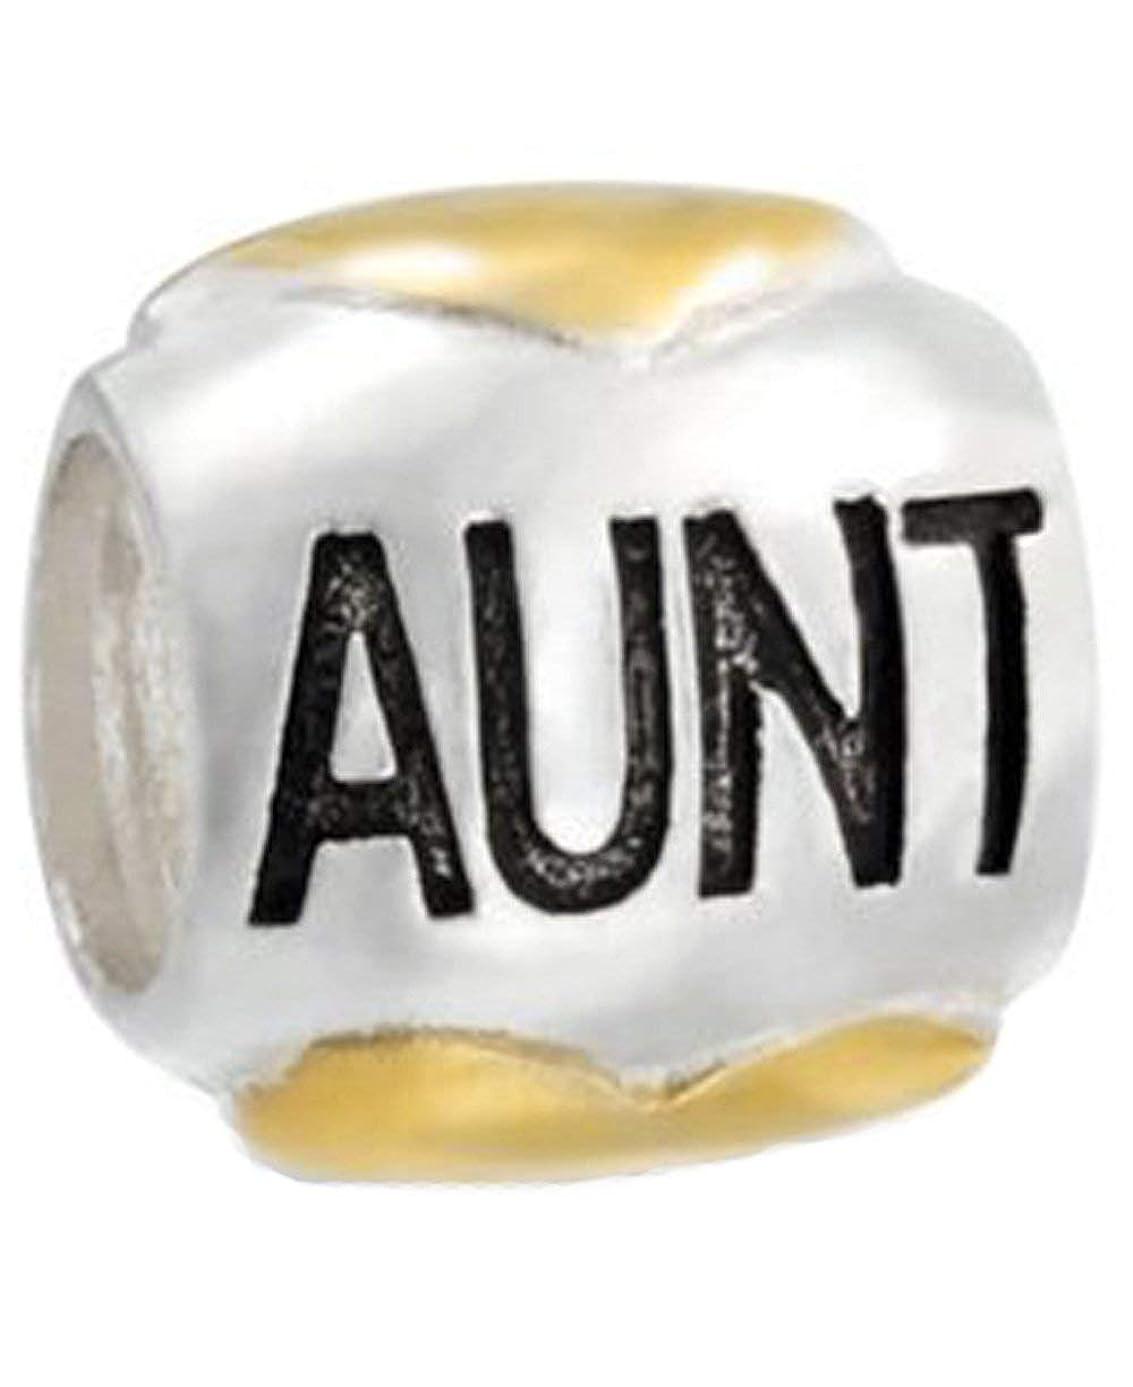 Family Aunt Heart Charm Bead - .925 Sterling Silver - Fits Pandora Charm Bracelet